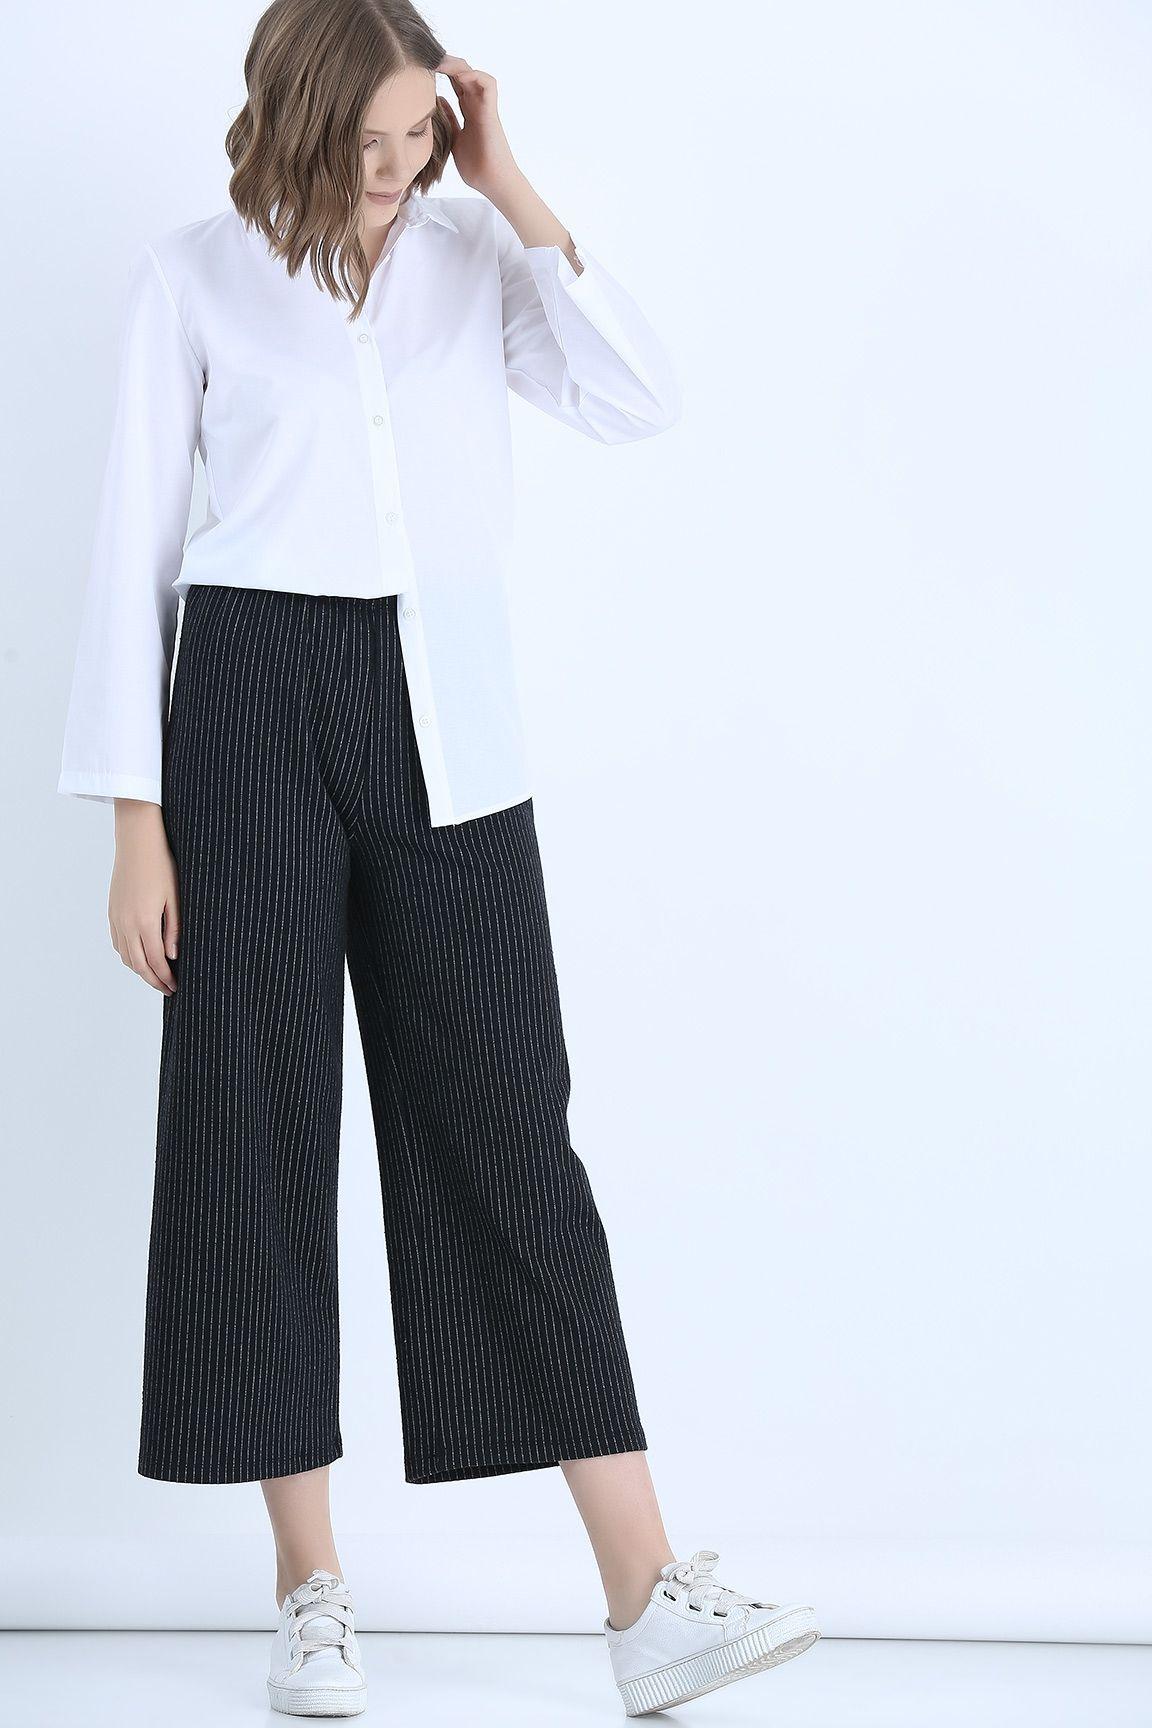 Kadin Gomlek Beyaz Gomlek Ve Kot Gomlek Modelleri Tozlu Com Kot Gomlek Gomlek Moda